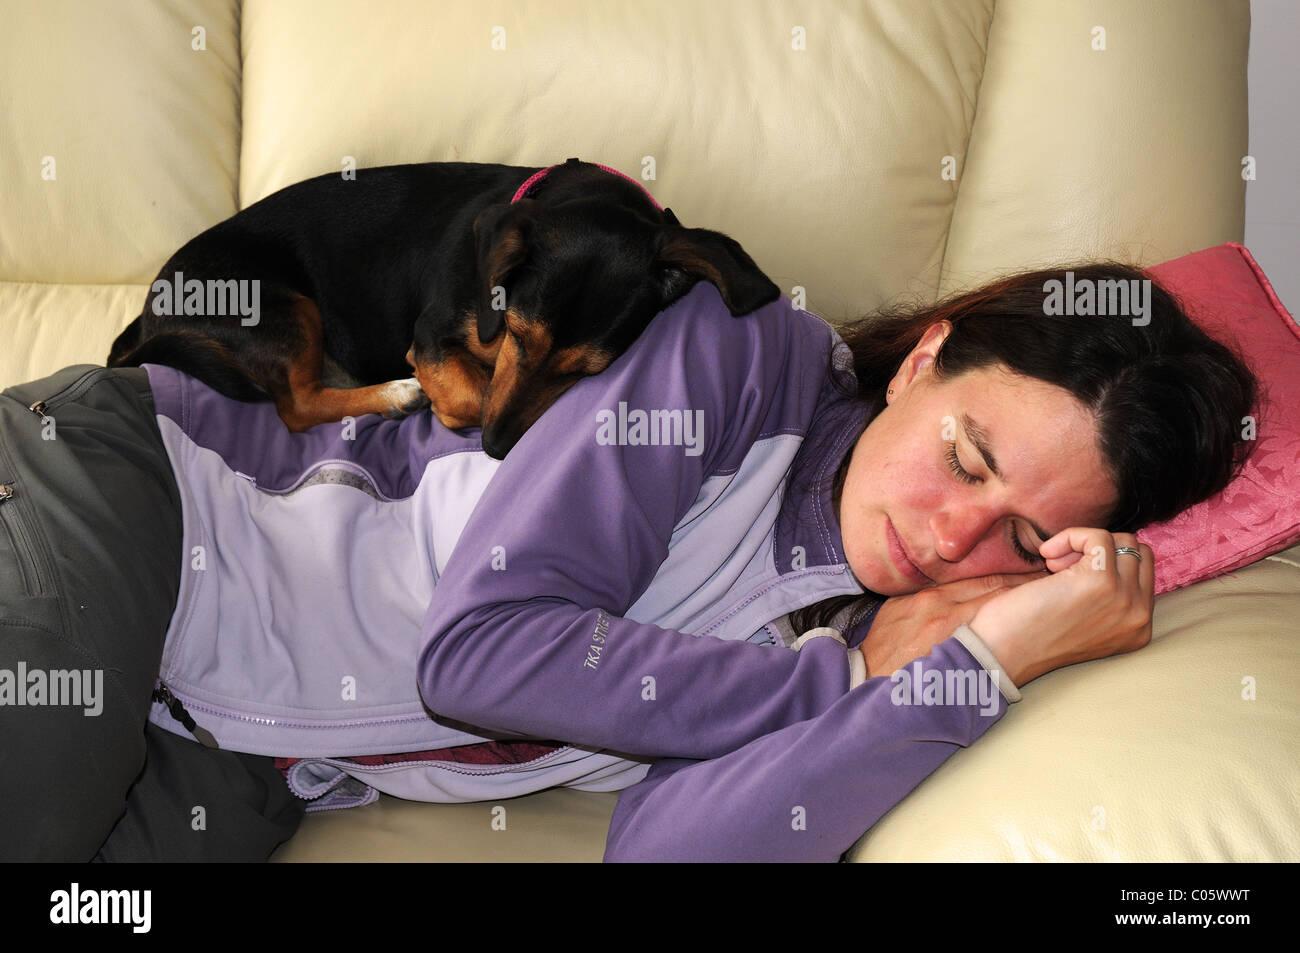 a-dog-curled-up-asleep-on-a-sleeping-wom